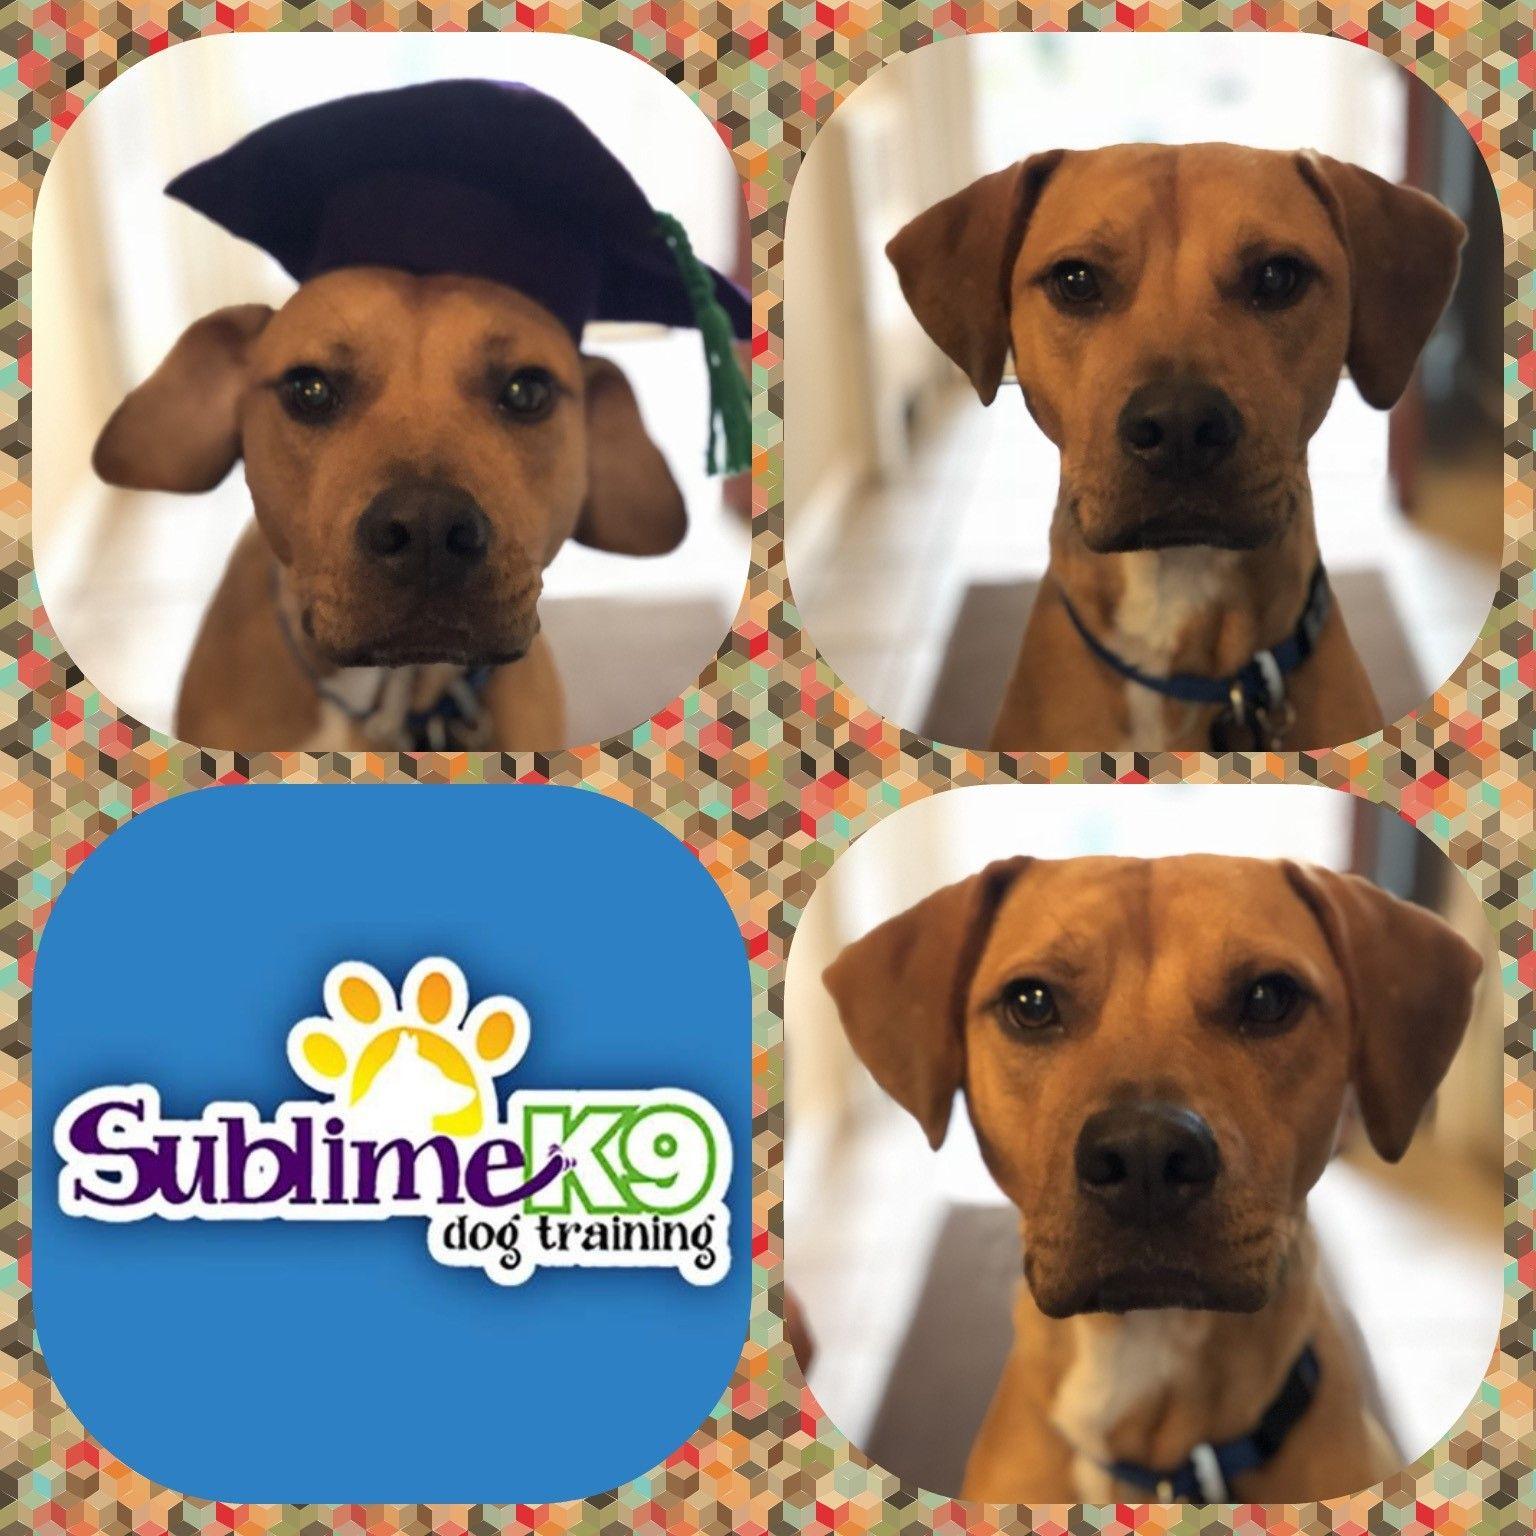 Long Island Dog Trainers Sublime K9 Dog Daycare Dogs Dog